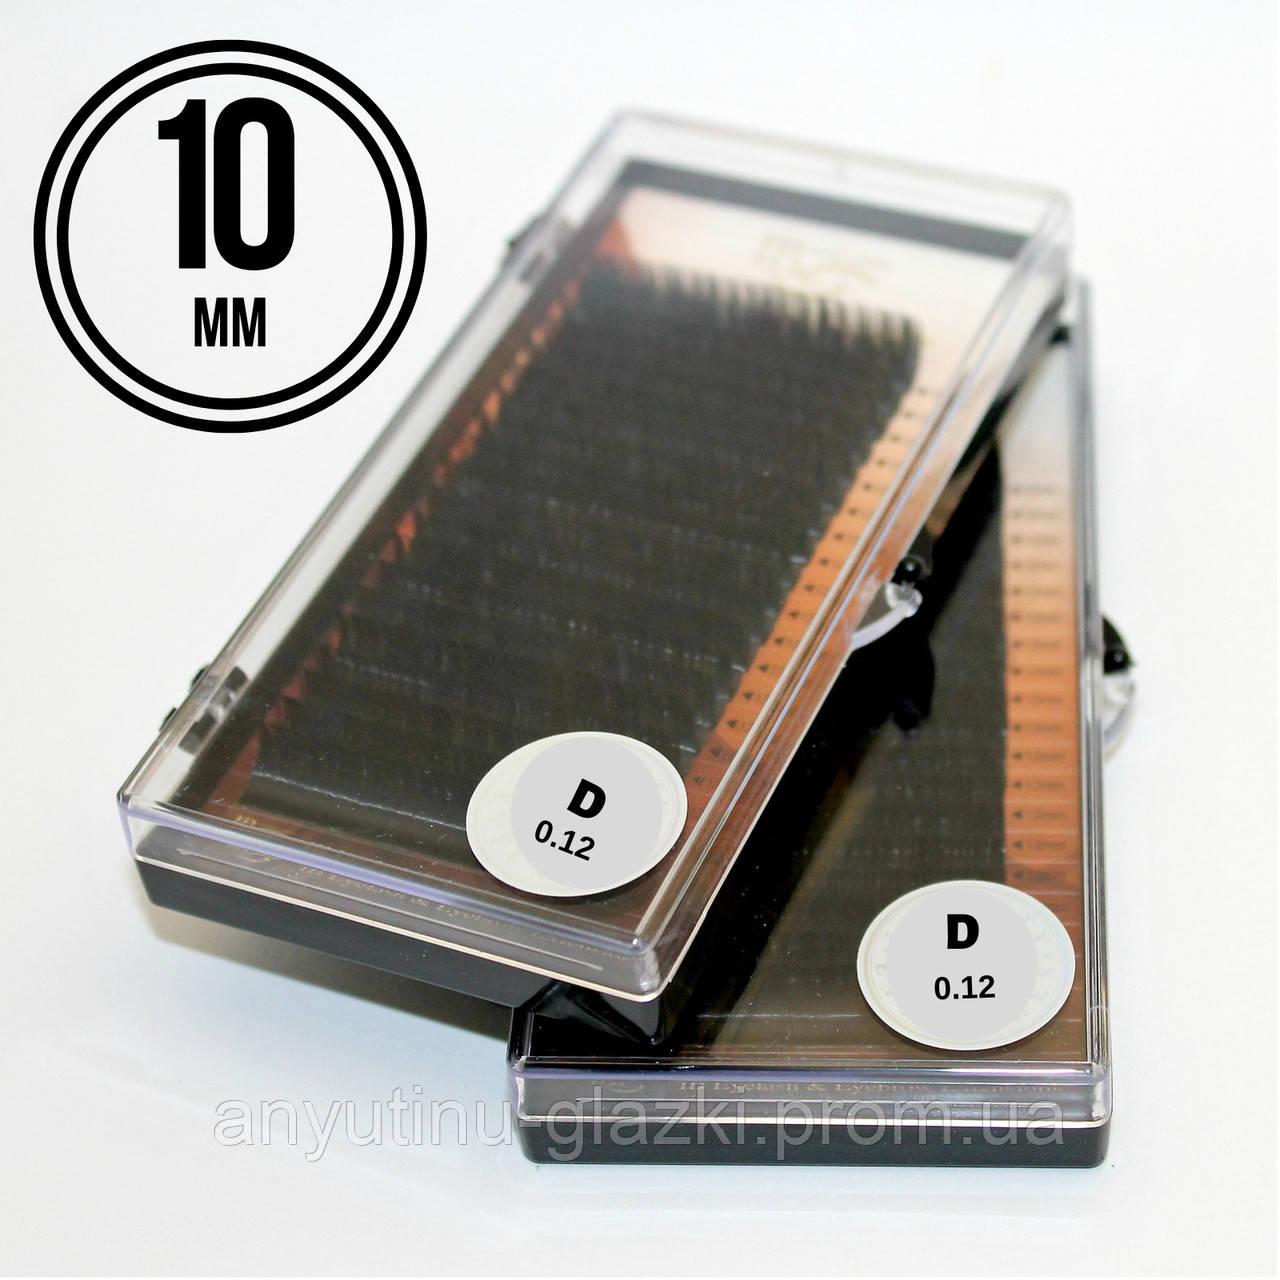 РЕСНИЦЫ I-BEAUTY PREMIUM, 20 ЛИНИЙ D 0.12 (10 мм)